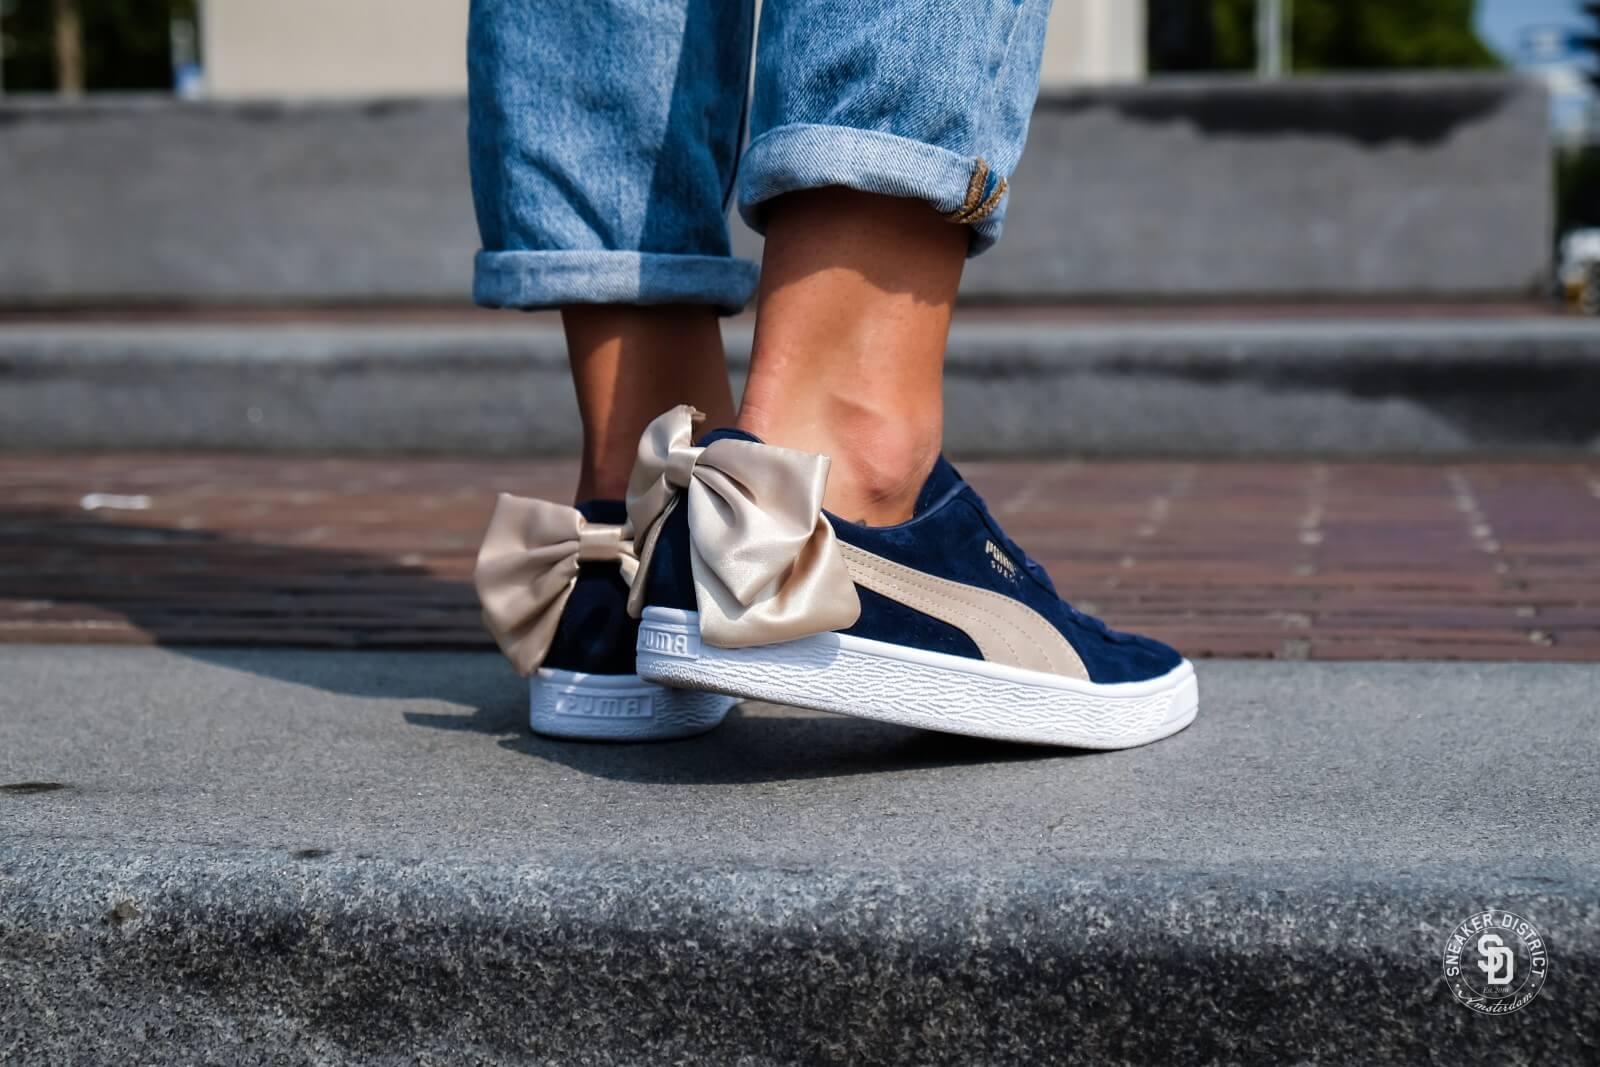 puma suede bow varsity women's sneakers